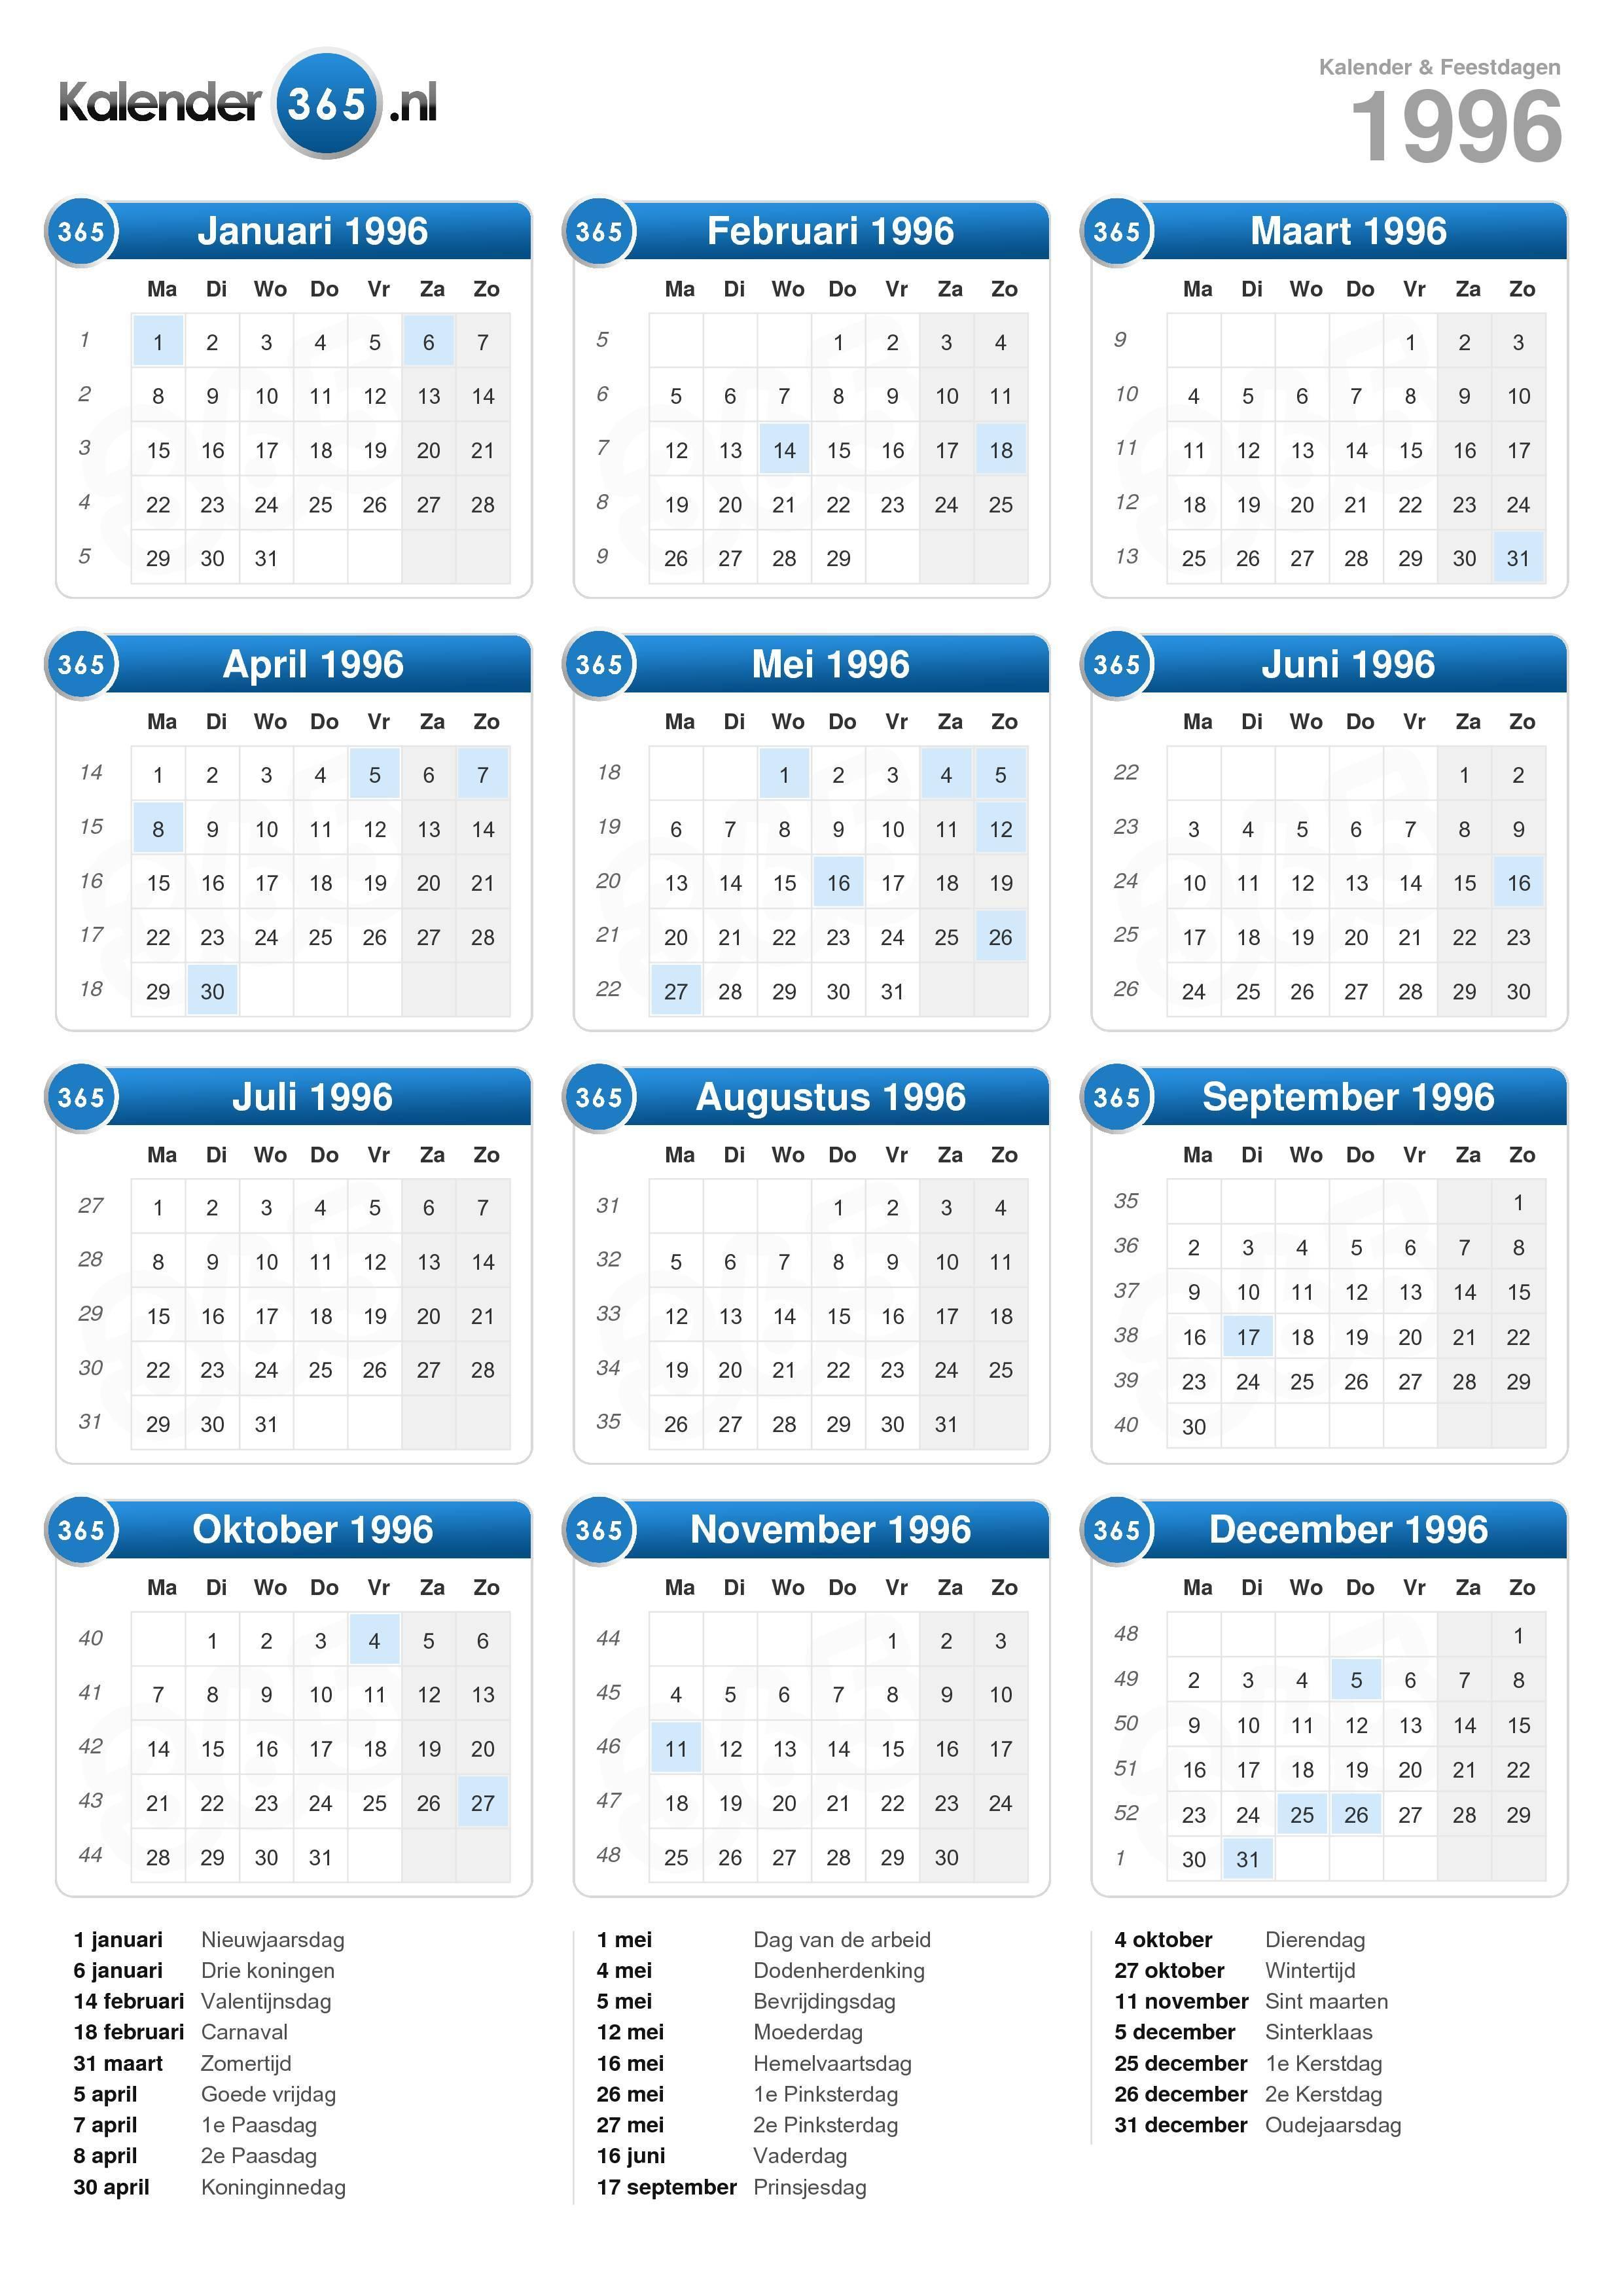 Kalender 1996